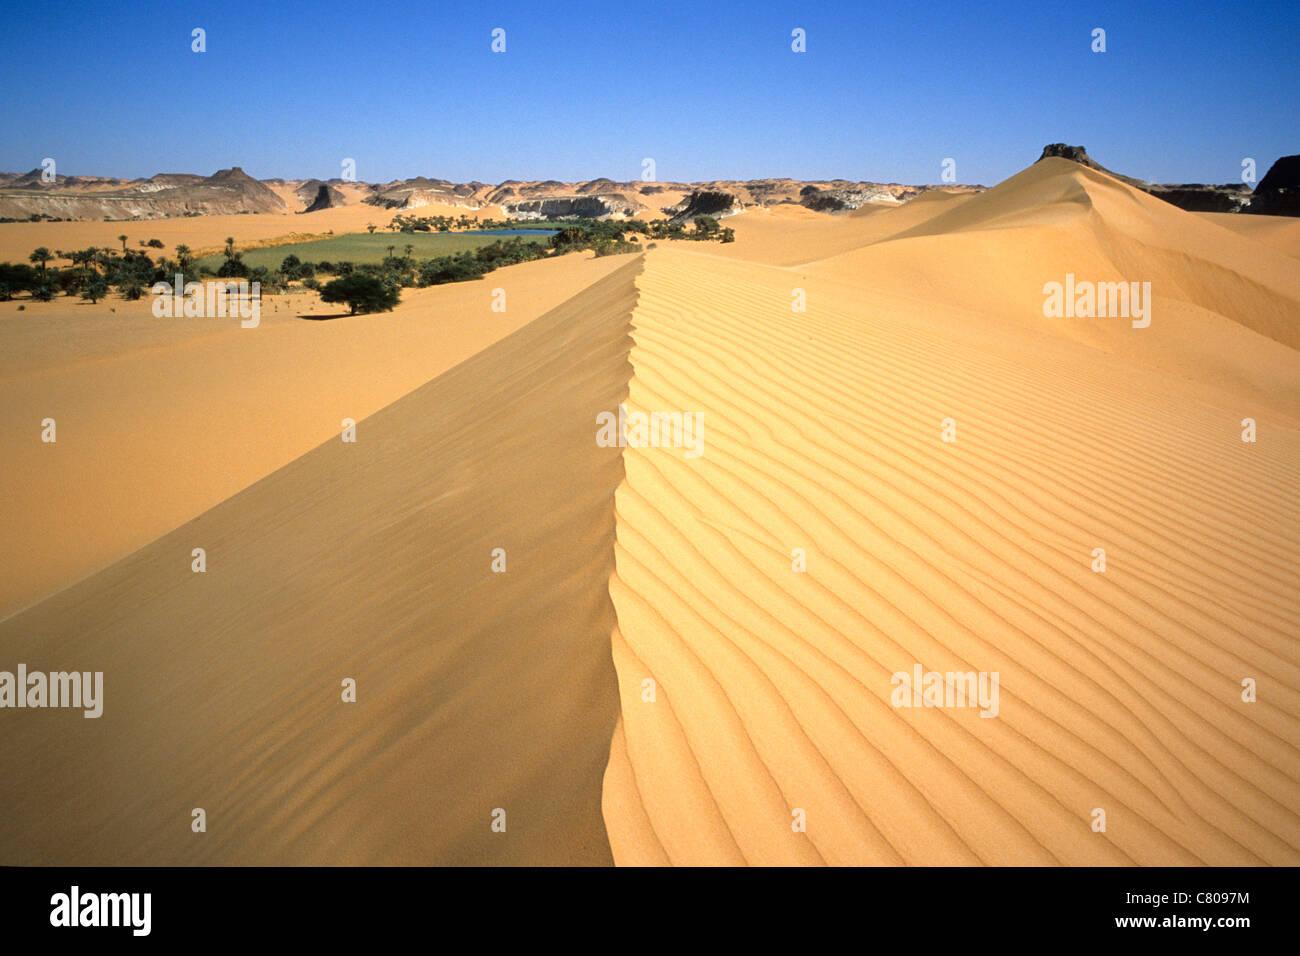 Africa, Chad, Ounianga Serir, Blue lake, the desert - Stock Image